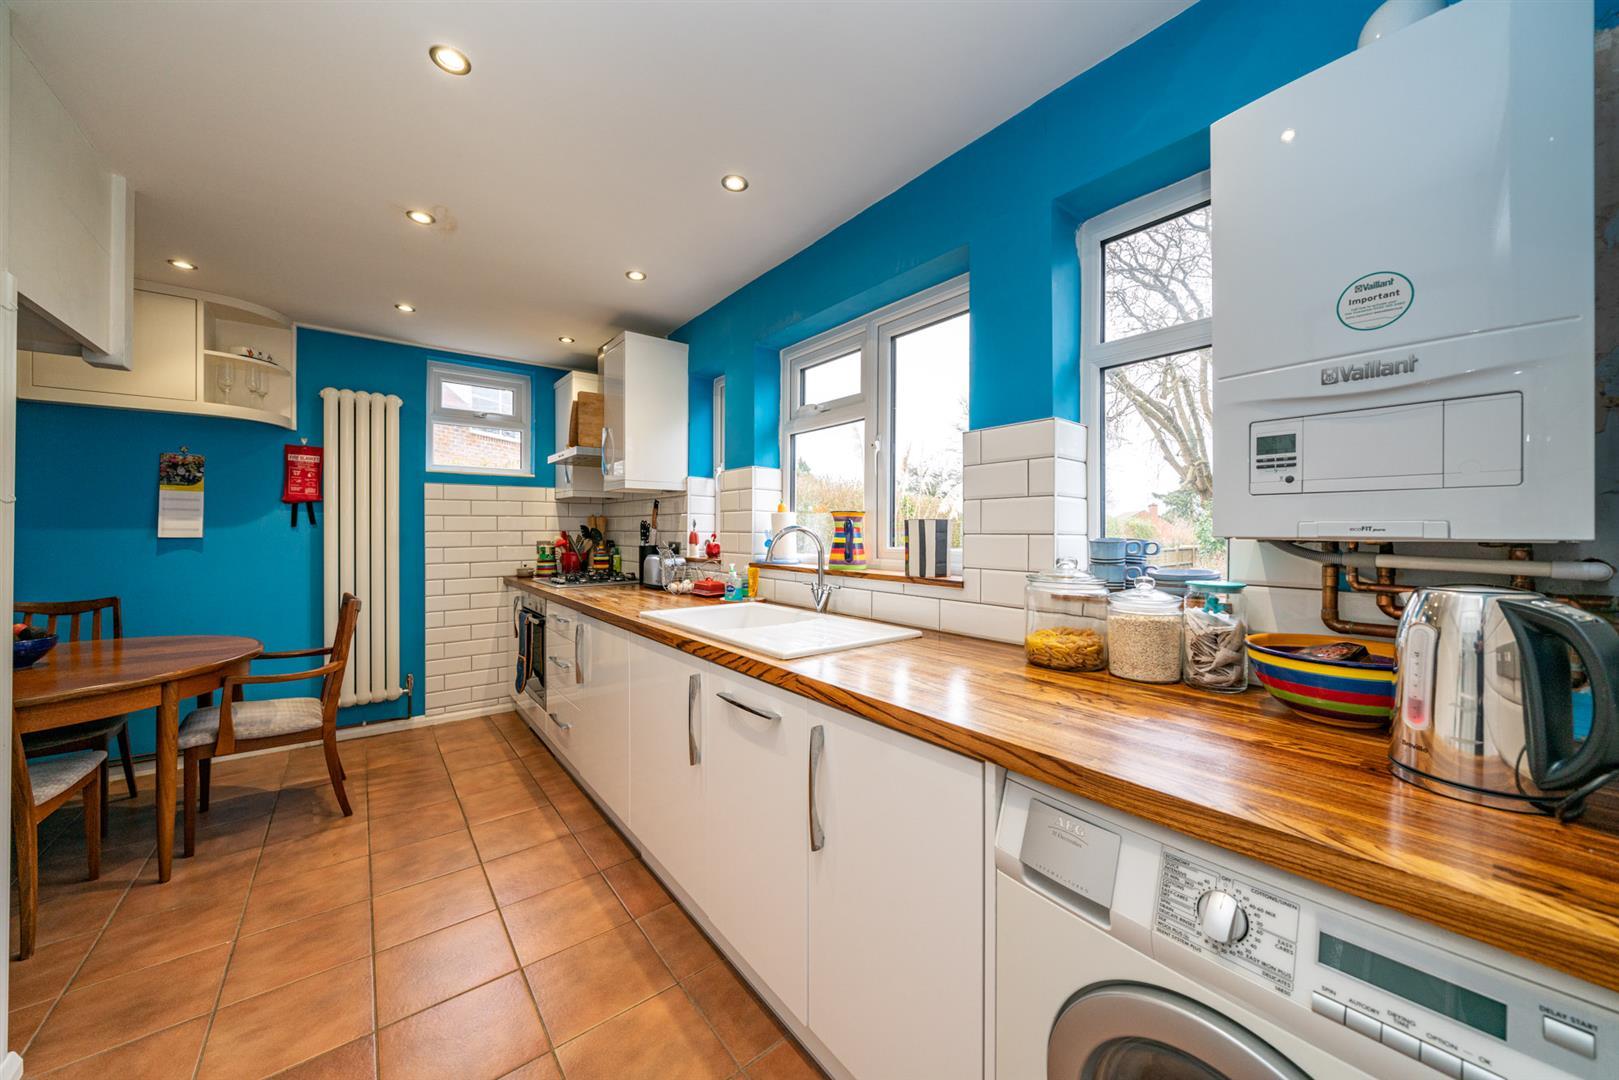 Flat-6-Ruscoe-5079 - kitchen 1.jpg